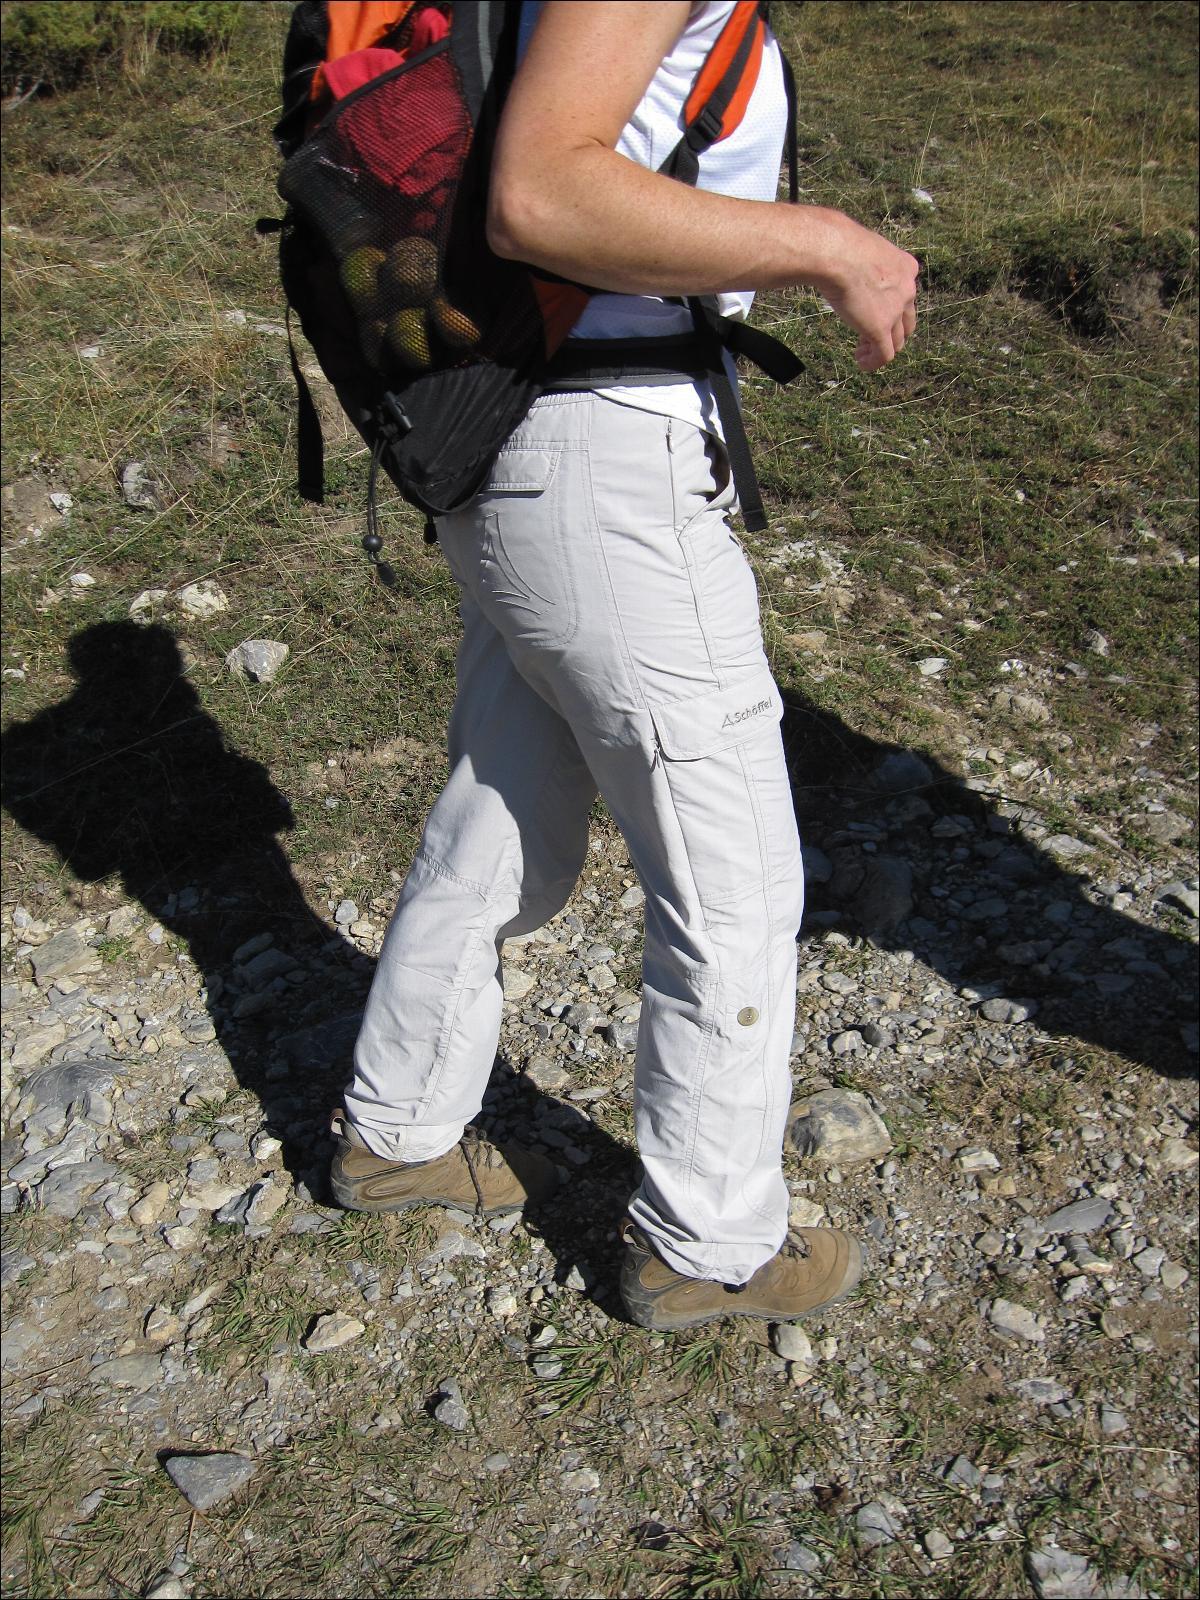 Schoeffel Schoeffel Pantalon Outdoor Pantalon Pants Pantalon Schoeffel Pants Pantalon Outdoor Outdoor Pants XiPkZuO